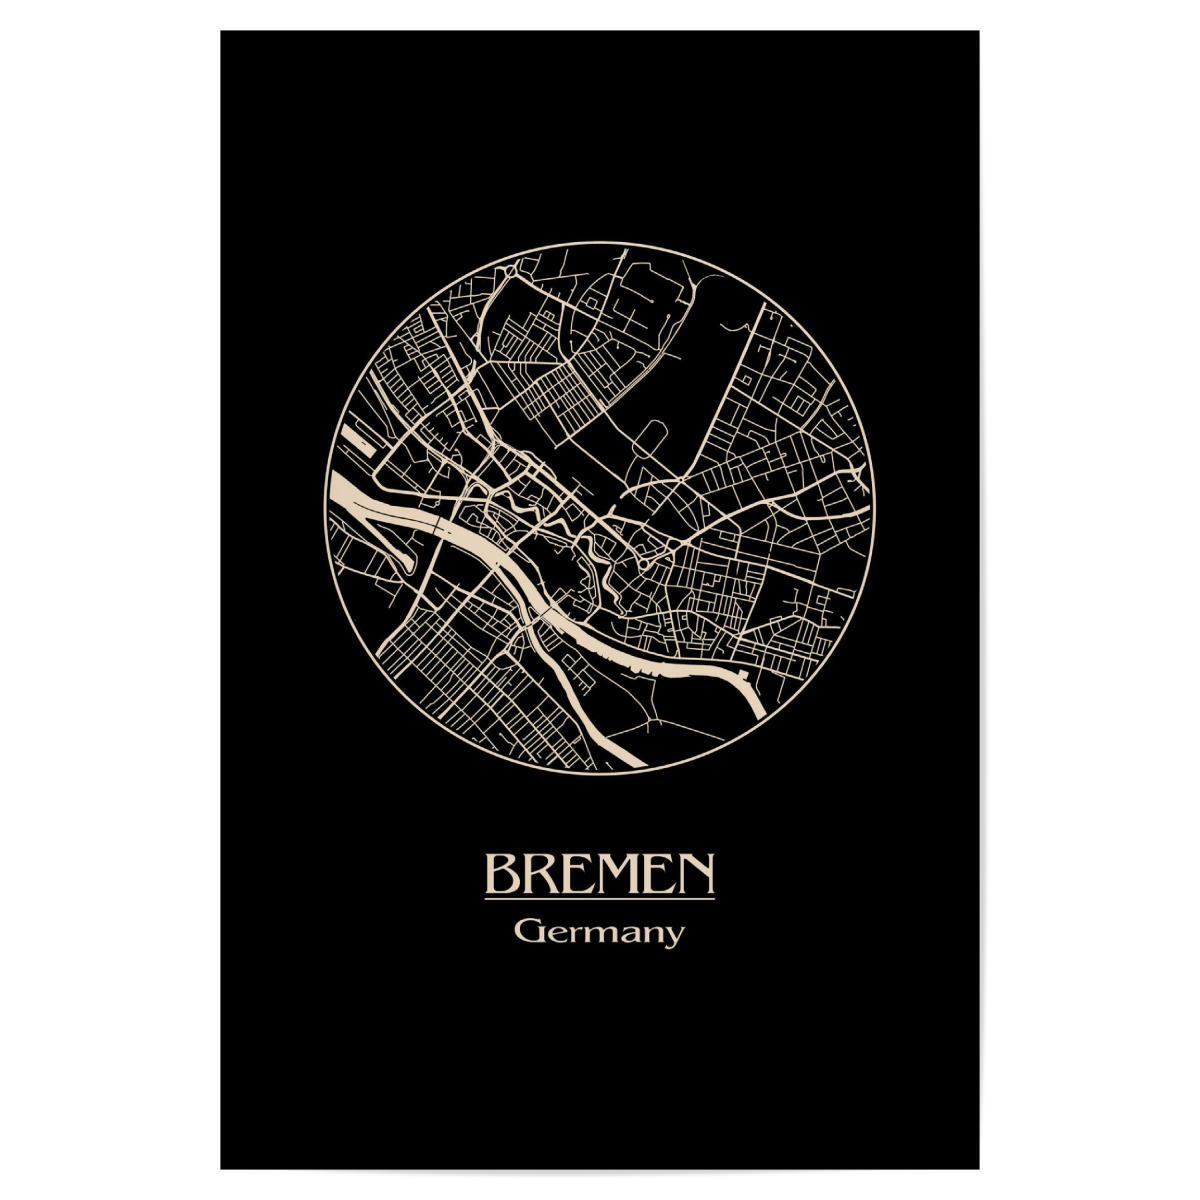 Bremen Germany Retro Map als Poster bei artboxONE kaufen on